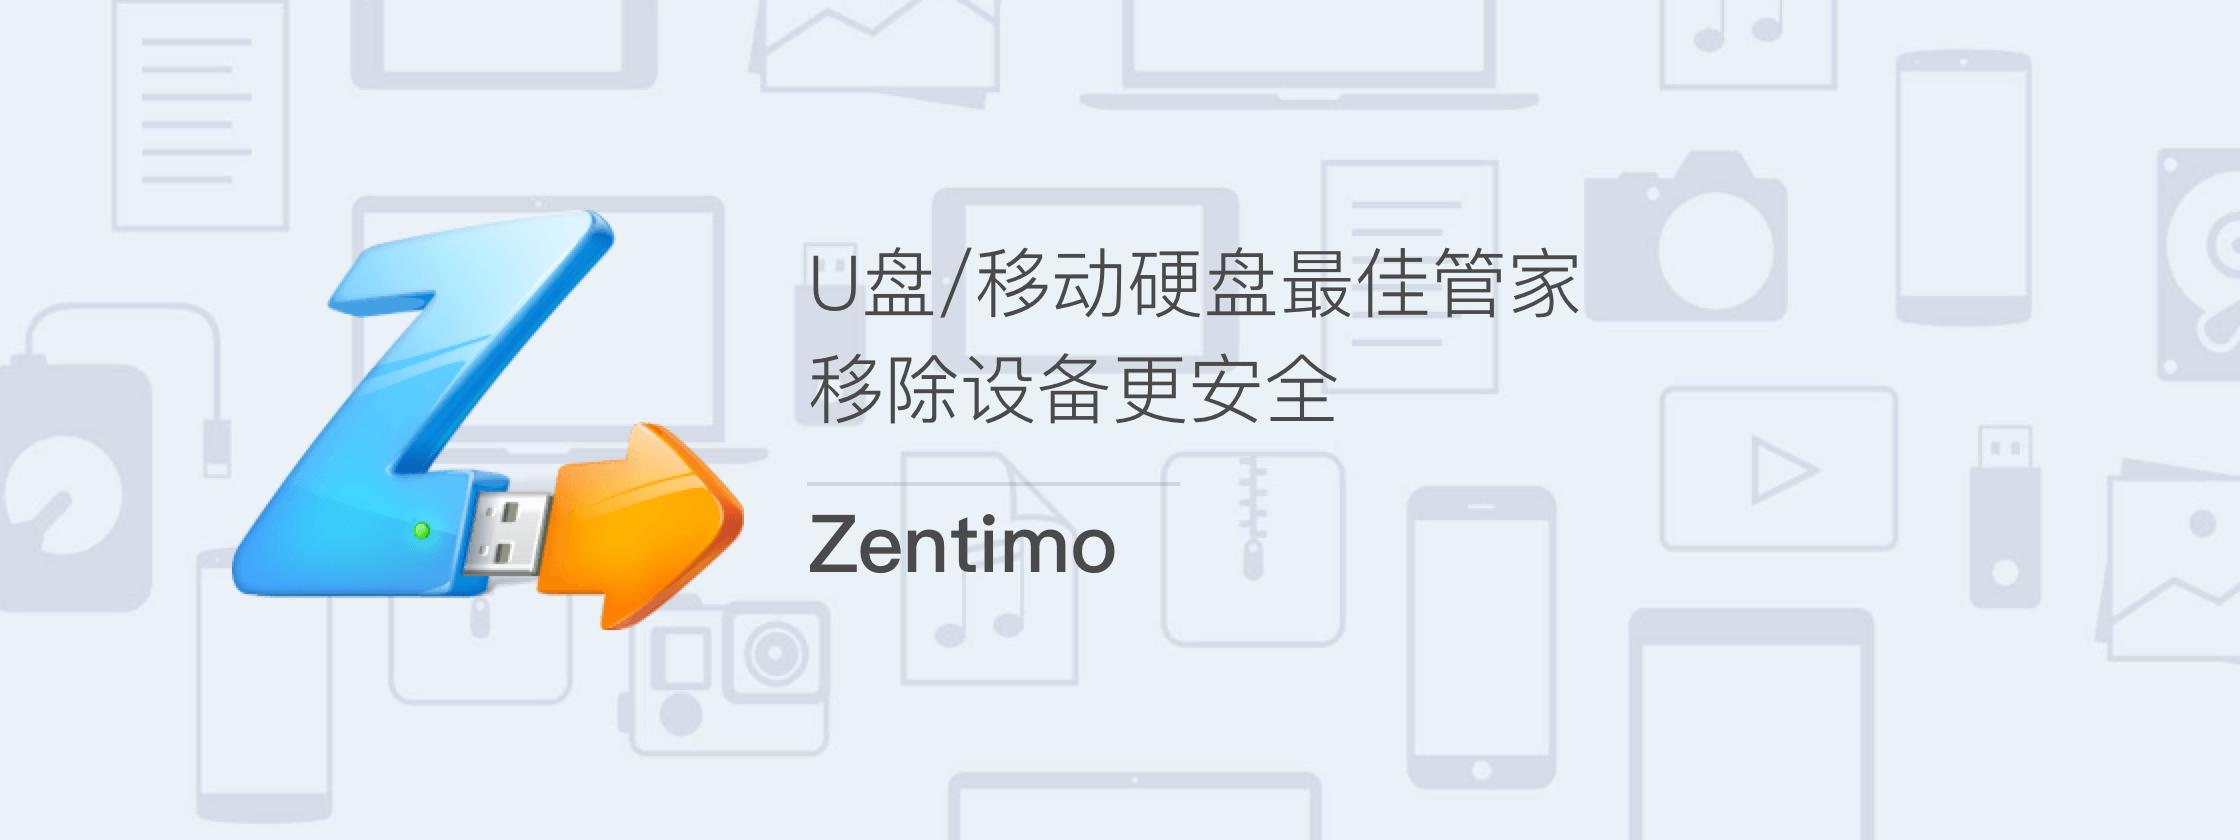 Zentimo – U 盘/移动硬盘最佳管家  移除设备更安全